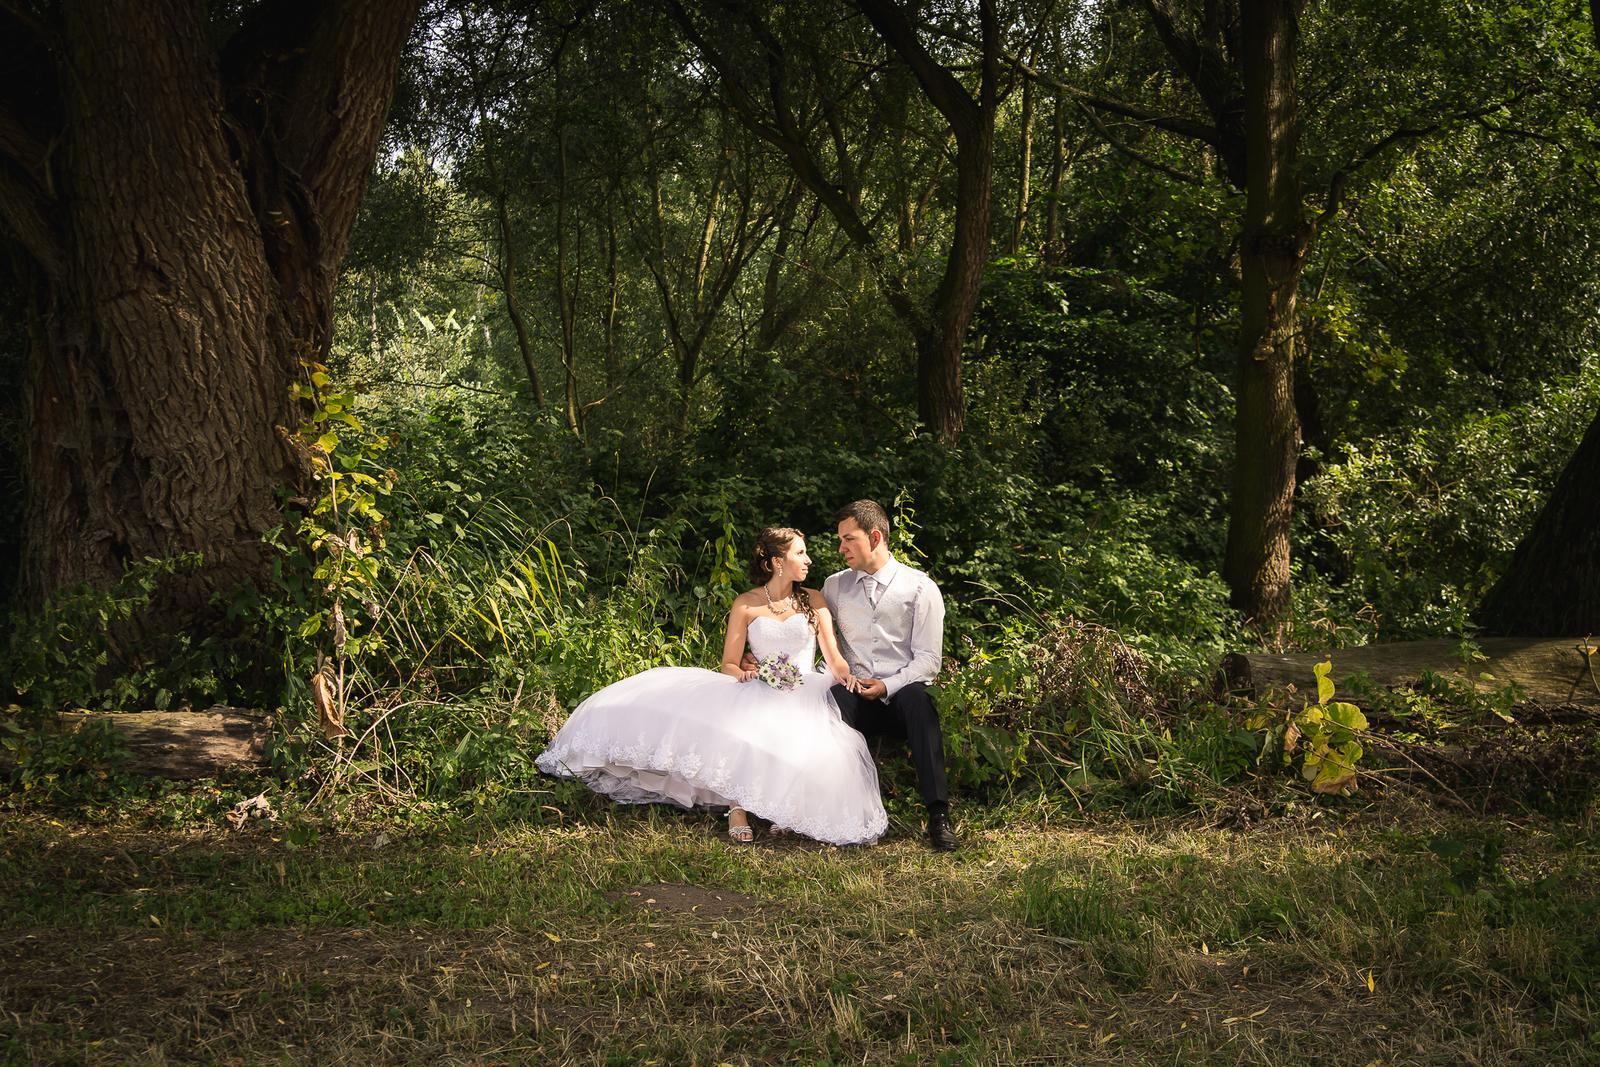 Lucie & Martin - Obrázek č. 1